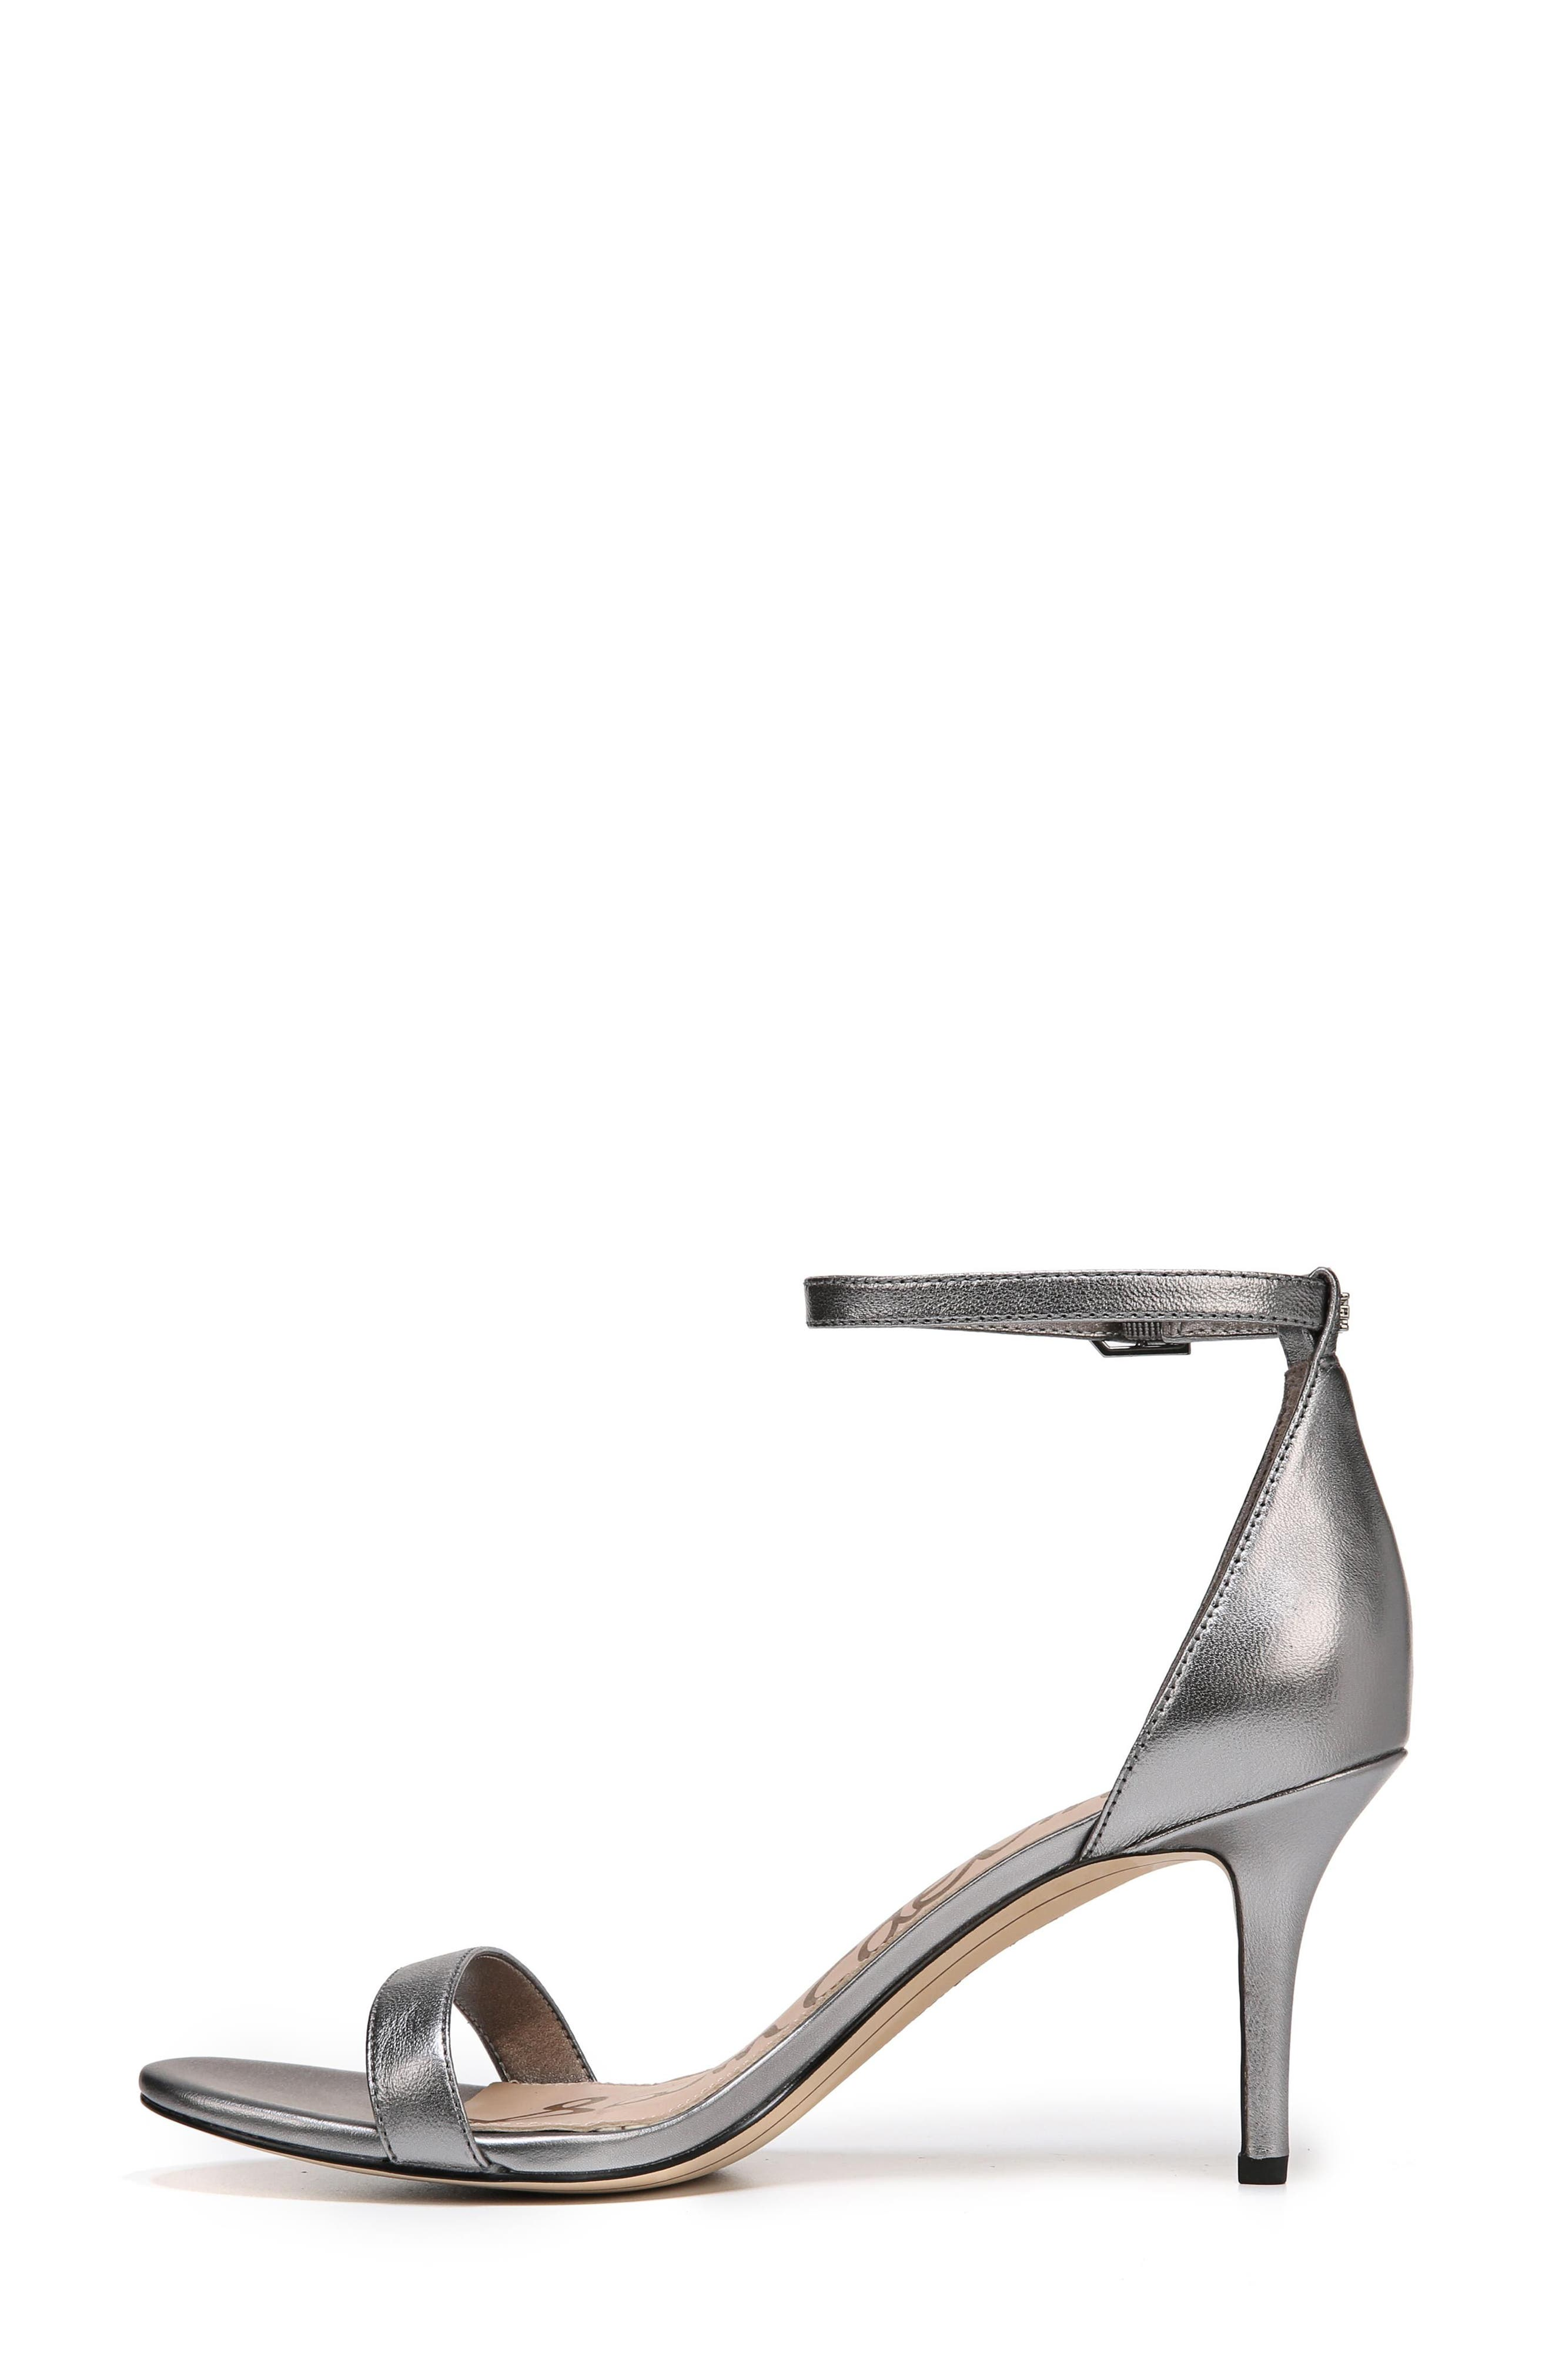 ,                             'Patti' Ankle Strap Sandal,                             Alternate thumbnail 27, color,                             040